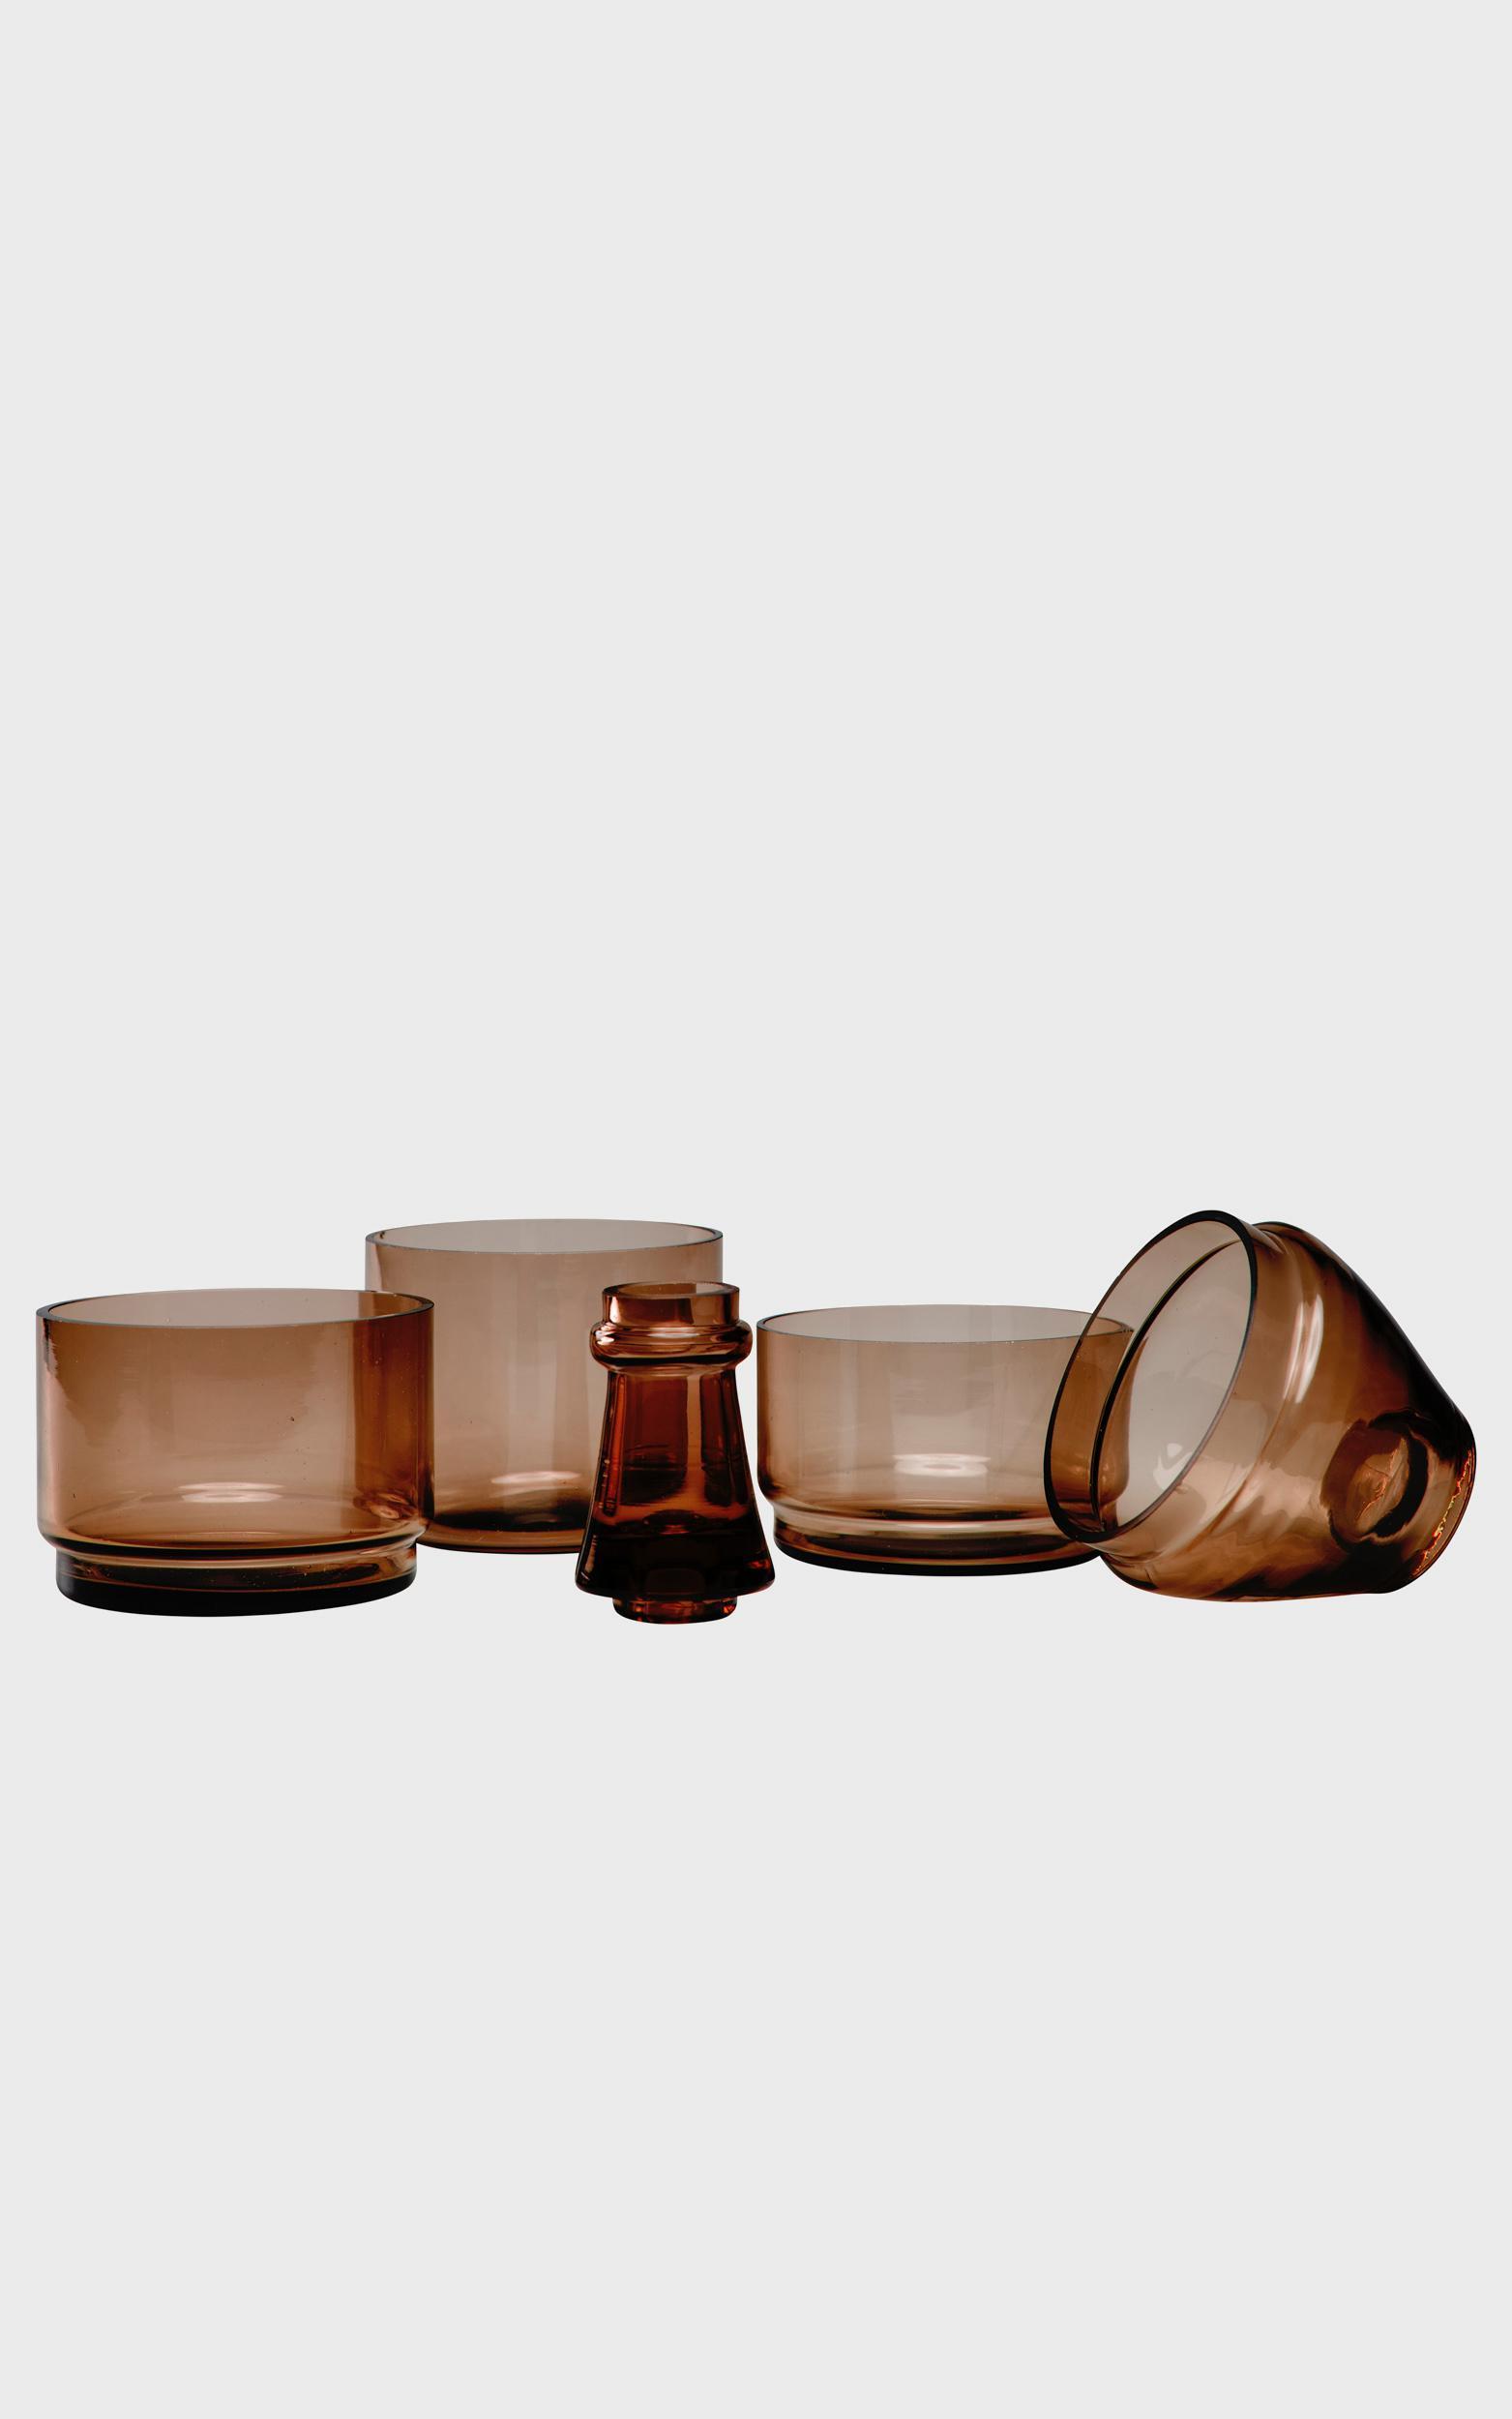 Doiy - L'apero Bowl Set, , hi-res image number null